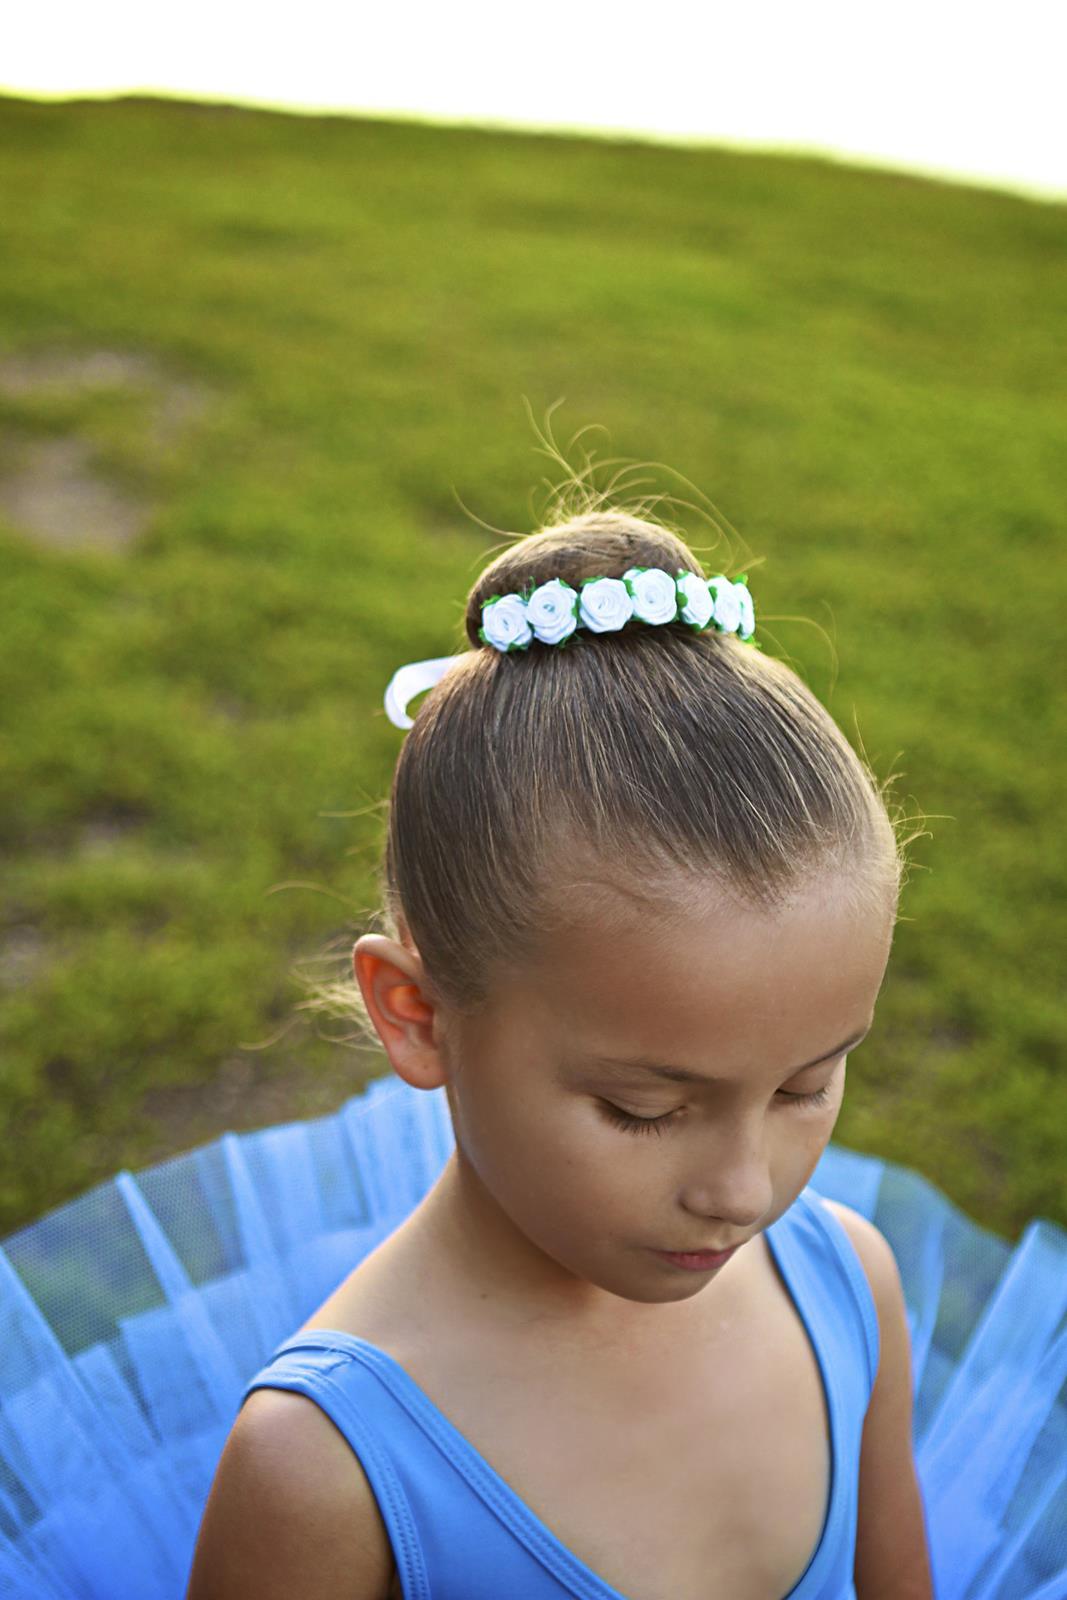 Odette Bun Flower Crown Hair En Pointe